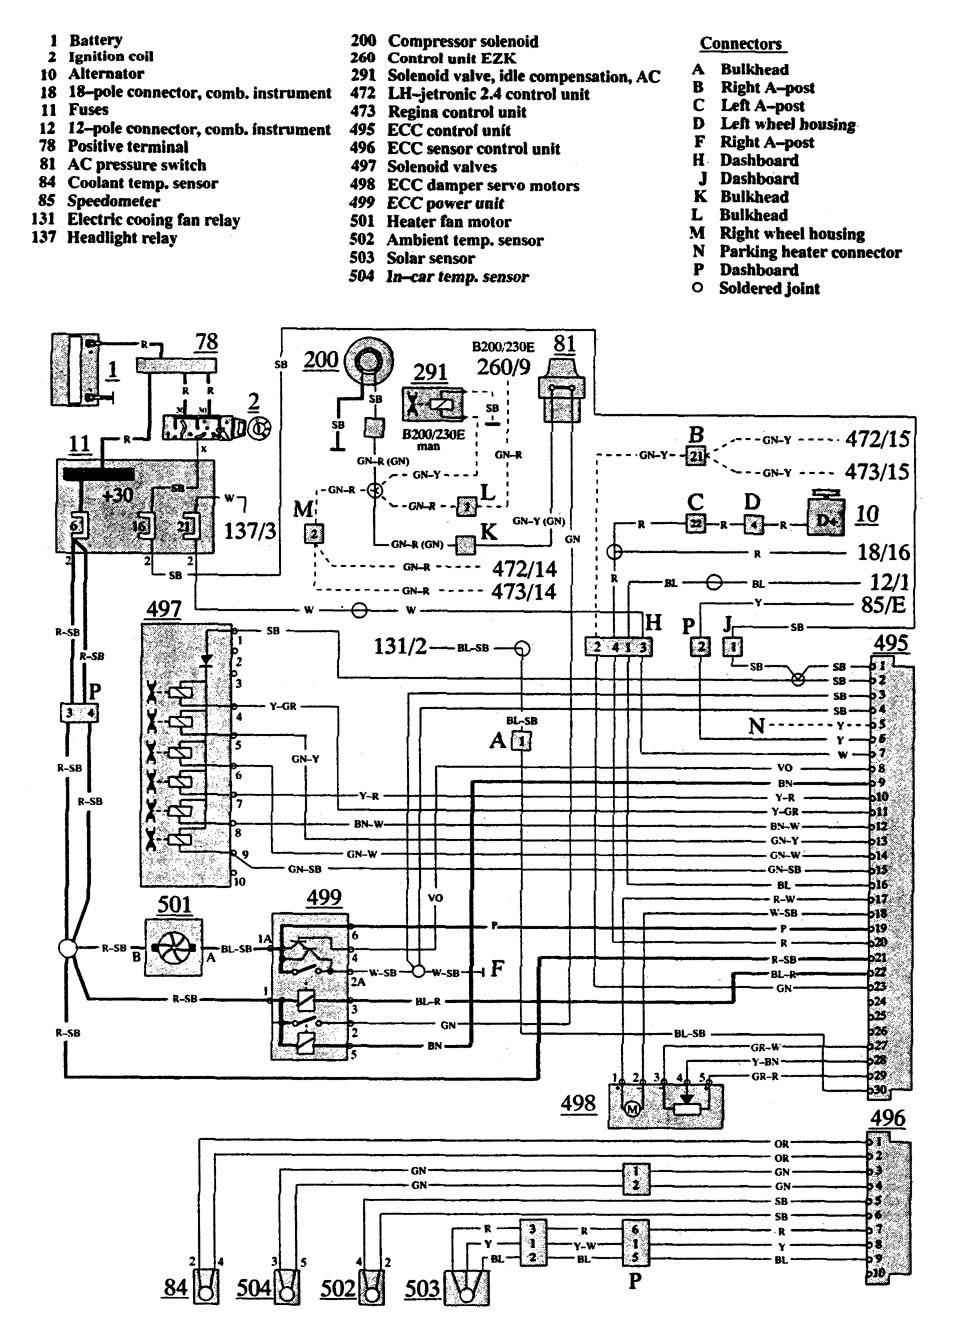 1991 jaguar xj6 fuse box wiring diagrams 1986 jaguar xj6 wiring diagram for jaguar xjs wiring